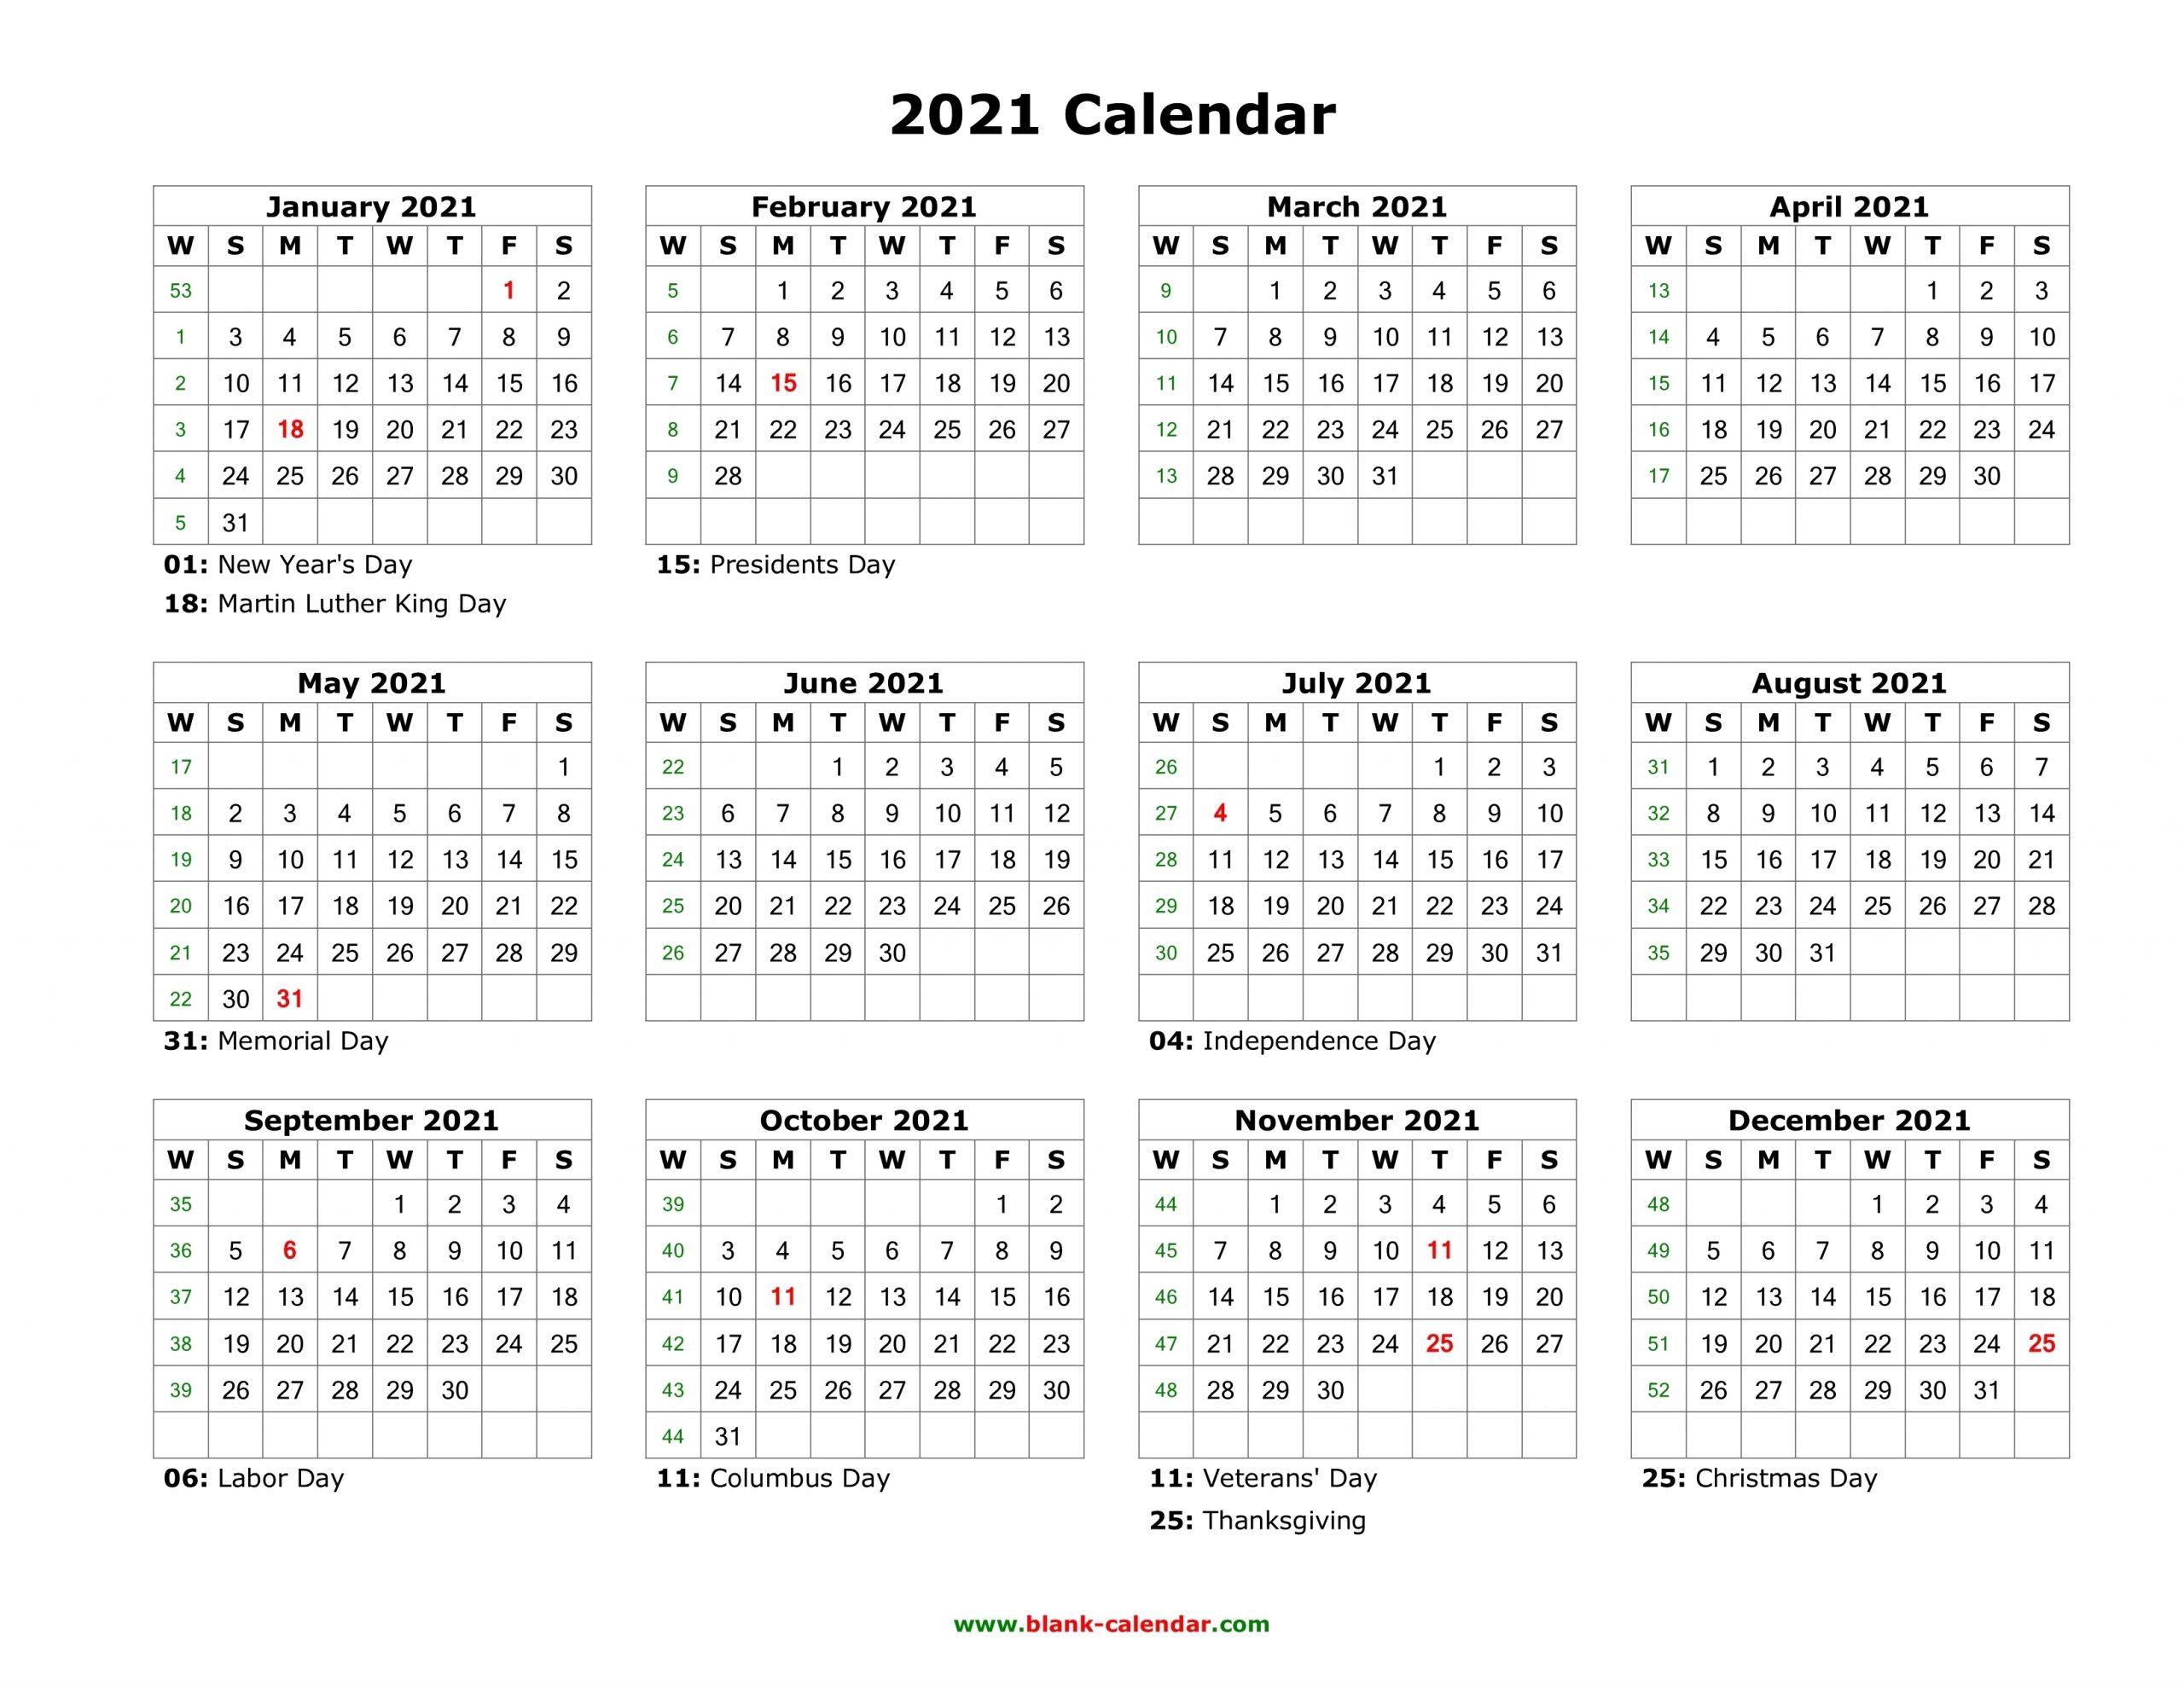 Blank Calendar 2021 | Free Download Calendar Templates